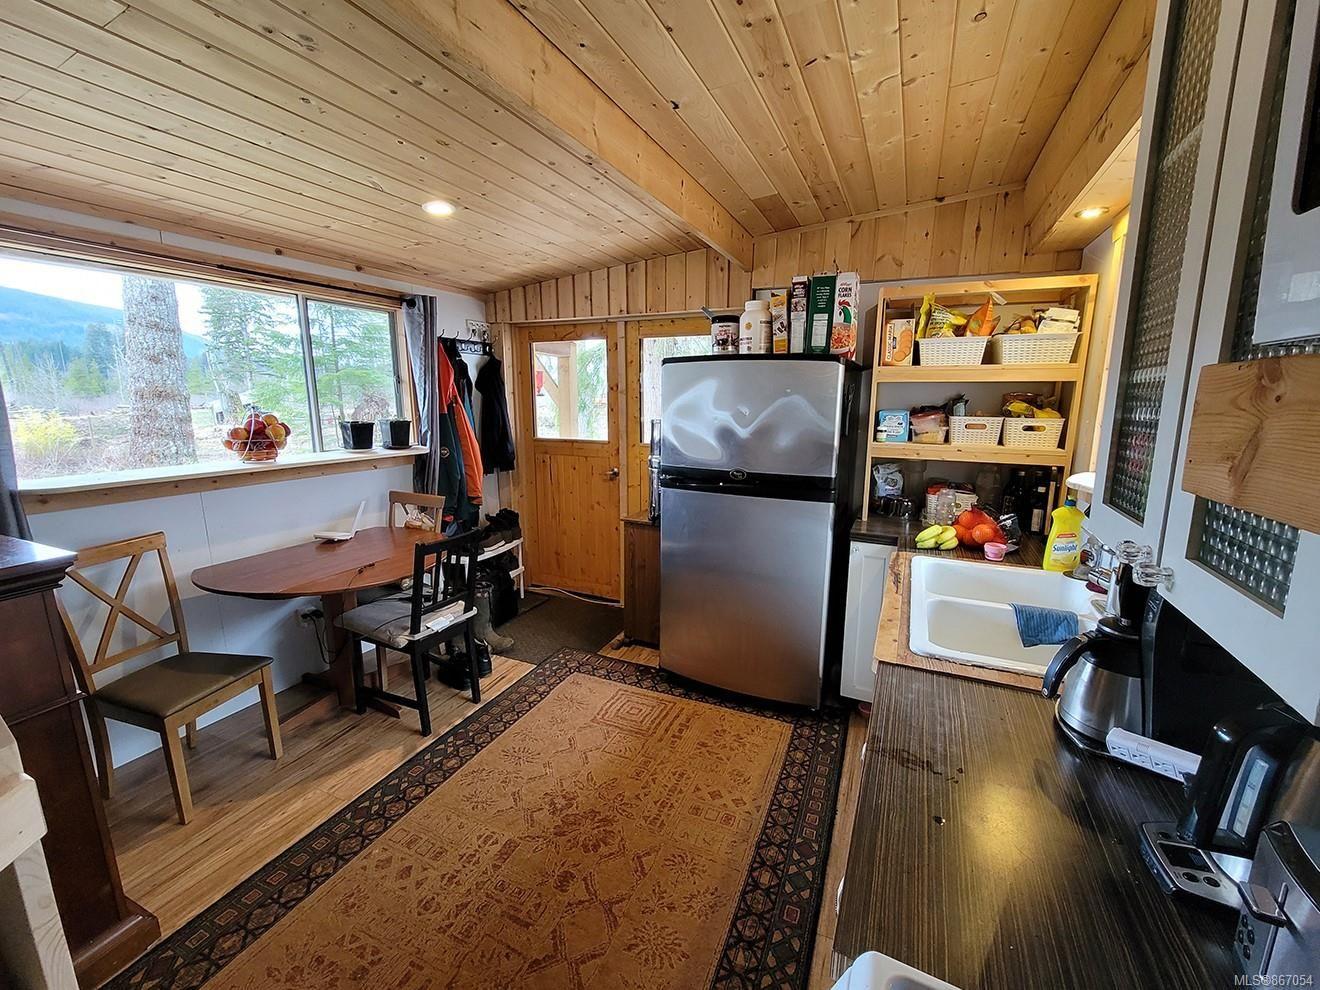 Photo 9: Photos: 2056 Spike Rd in : CV Merville Black Creek House for sale (Comox Valley)  : MLS®# 867054